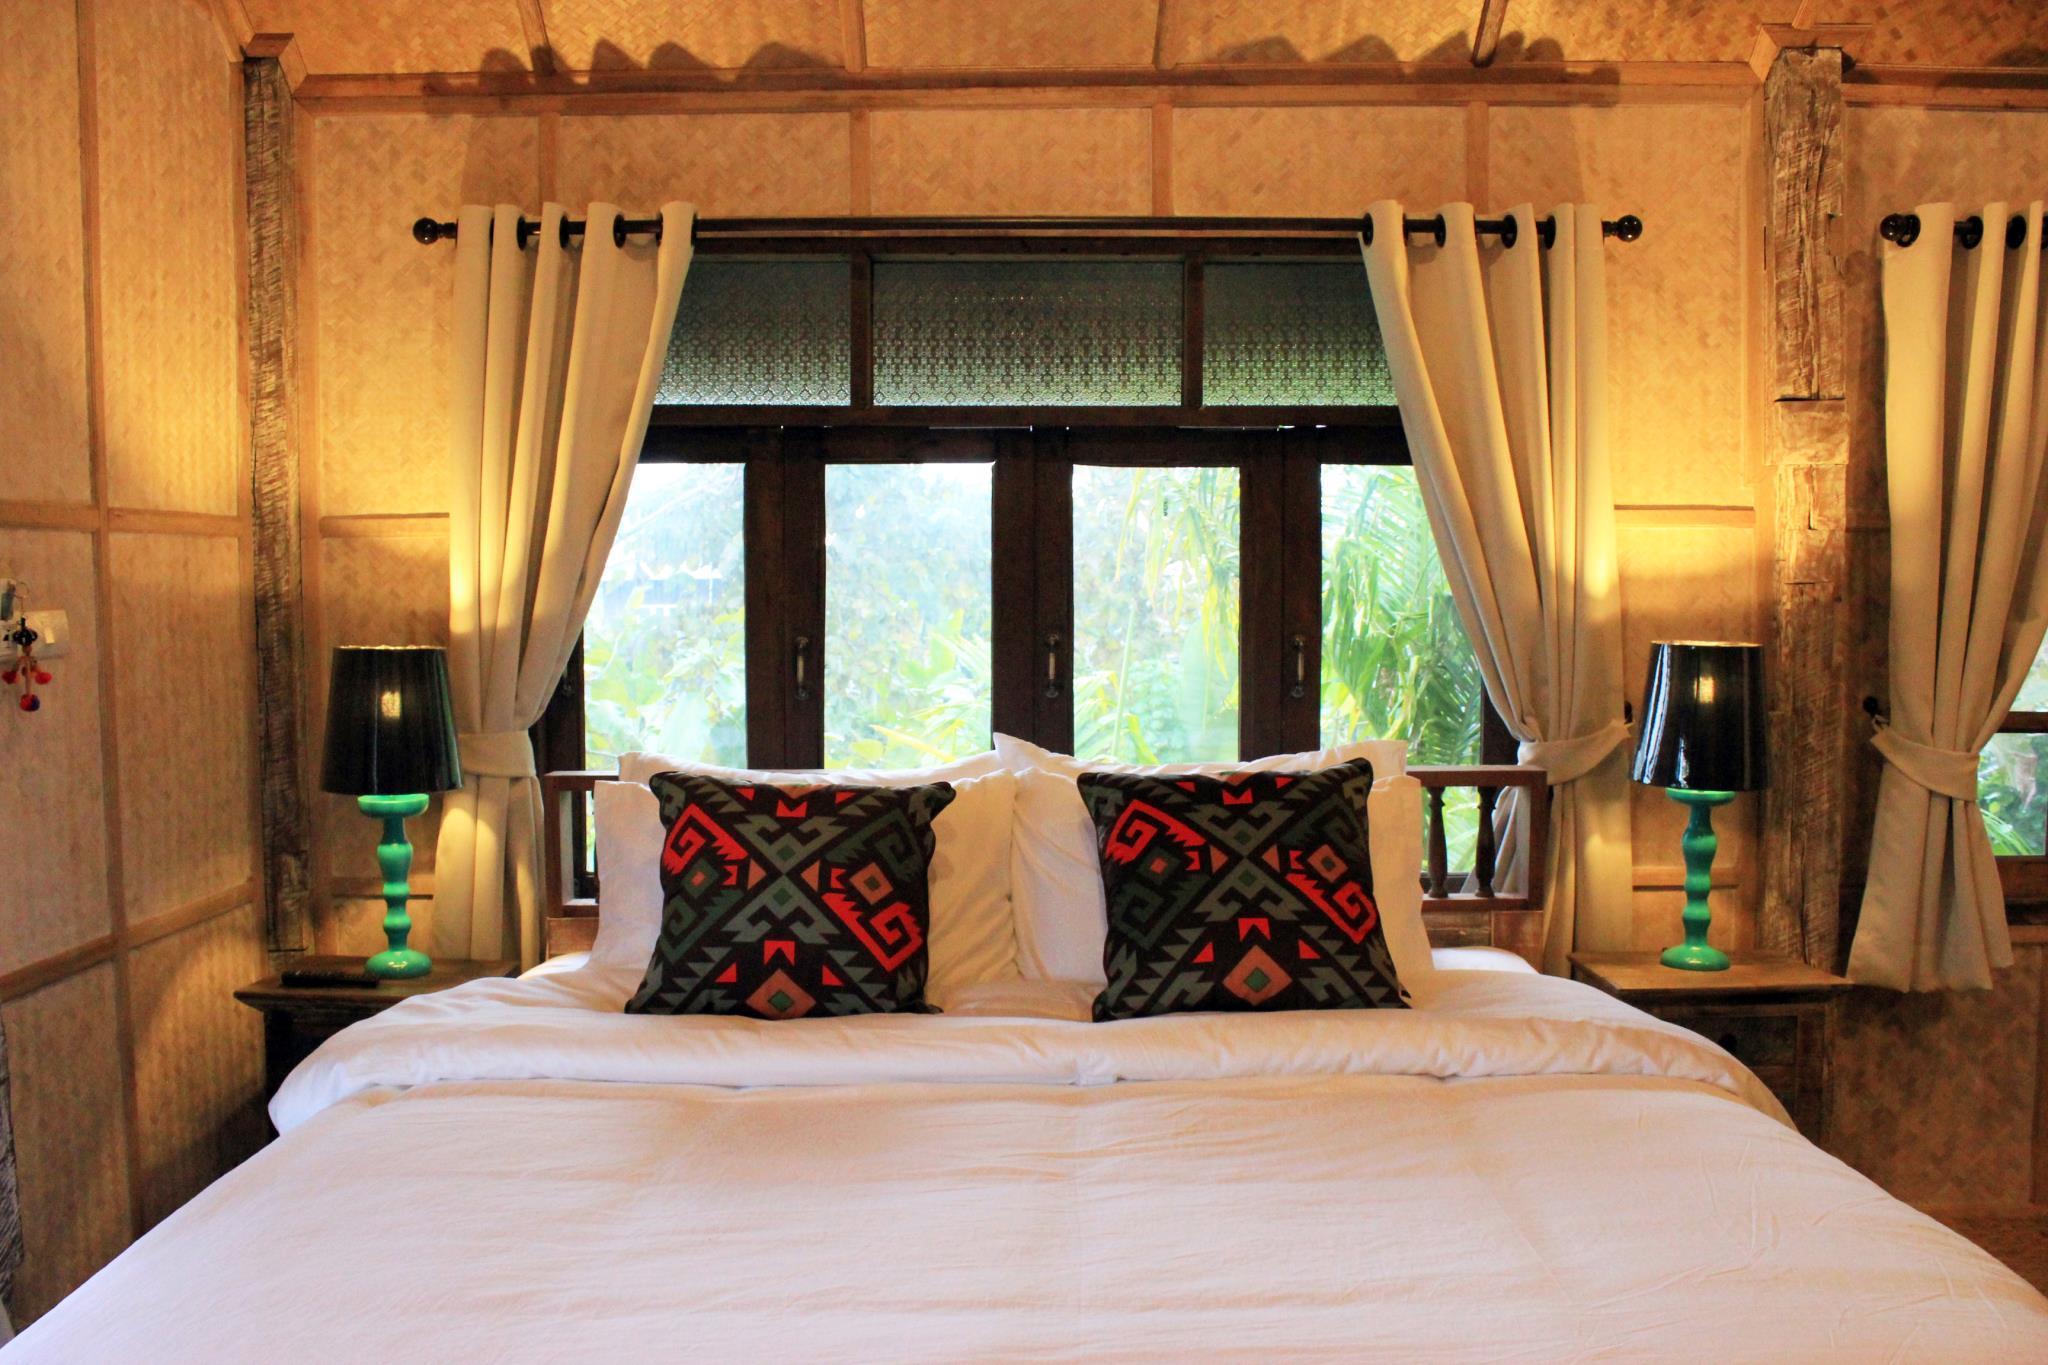 Baanchandra home stay Double Bedded Room.,สตูดิโอ บ้าน 0 ห้องน้ำส่วนตัว ขนาด 43 ตร.ม. – หางดง